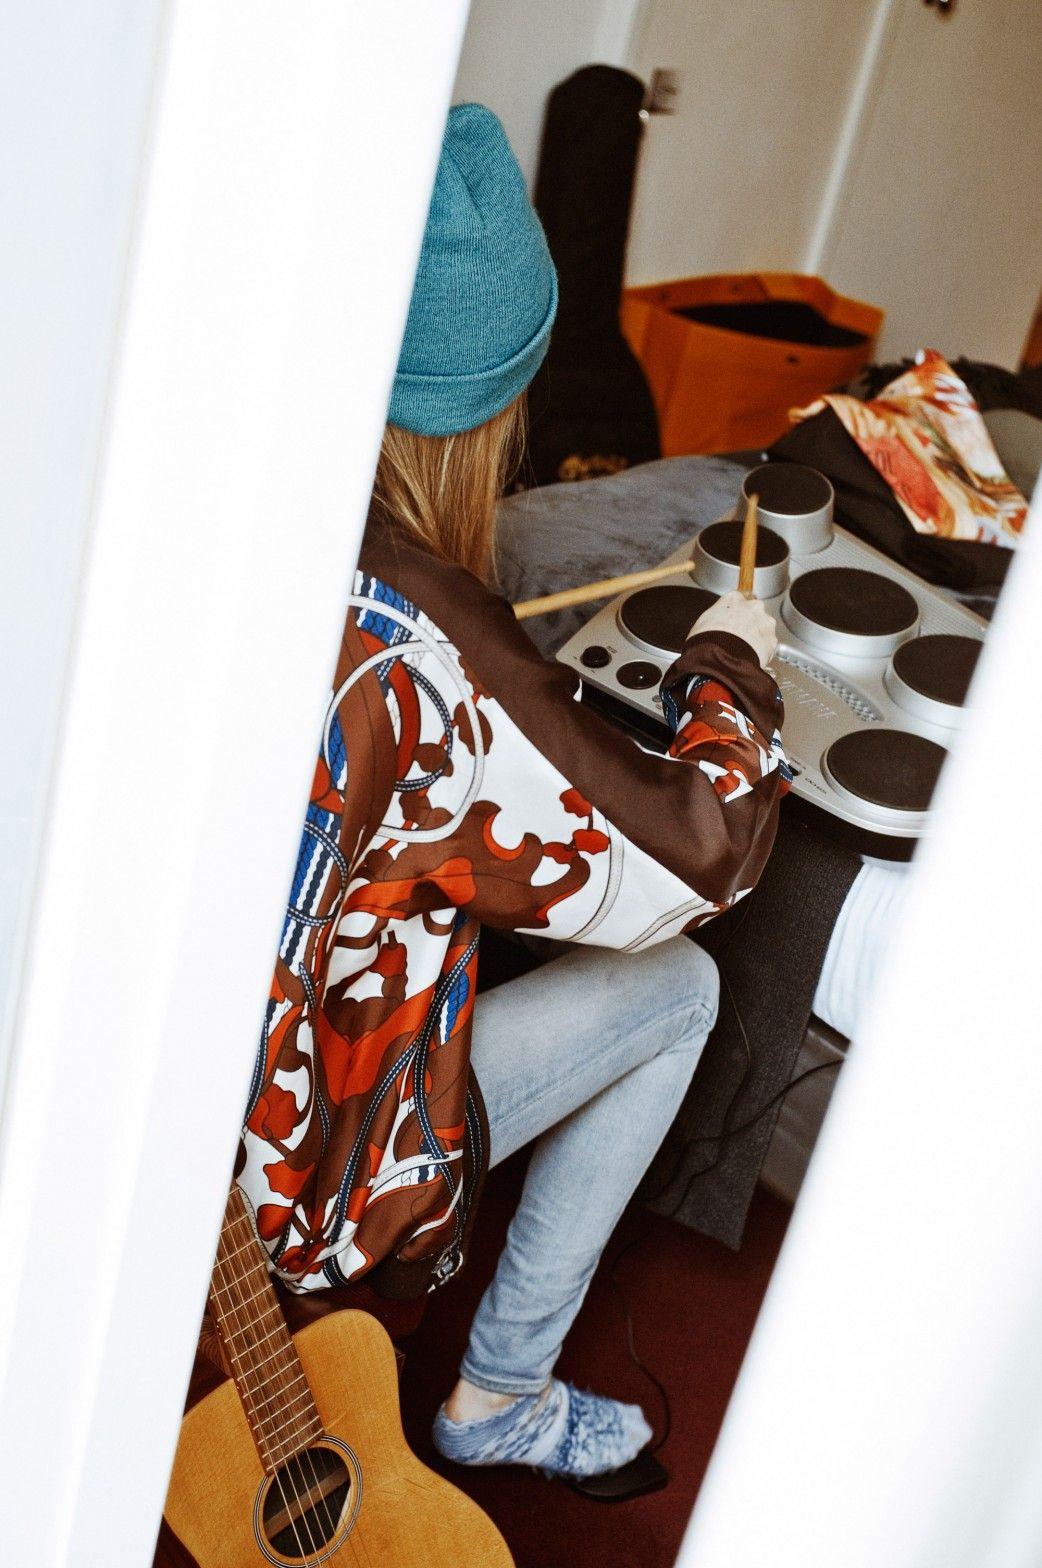 Cara Delevingne: The Photos - cara delevingne playing a drum machine